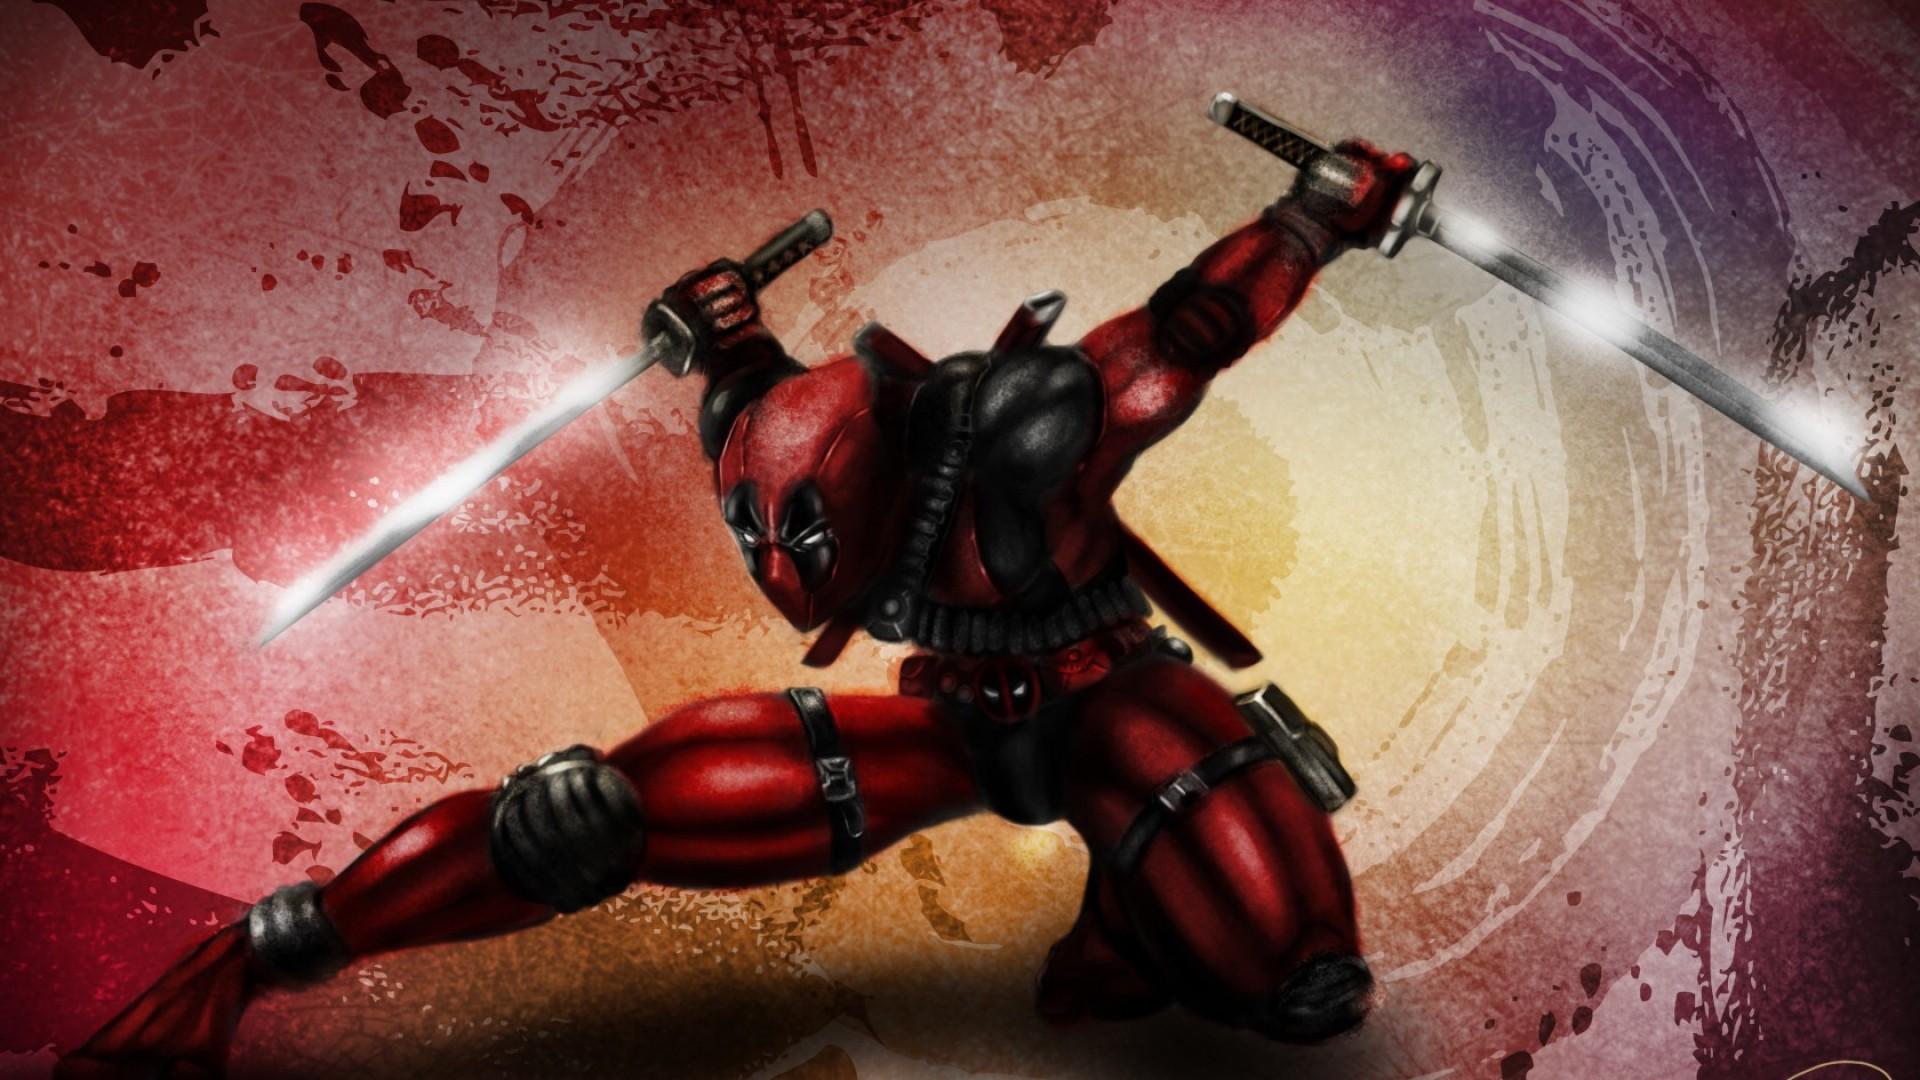 Deadpool wallpaper 1920x1080 download free stunning hd - Deadpool download 1080p ...